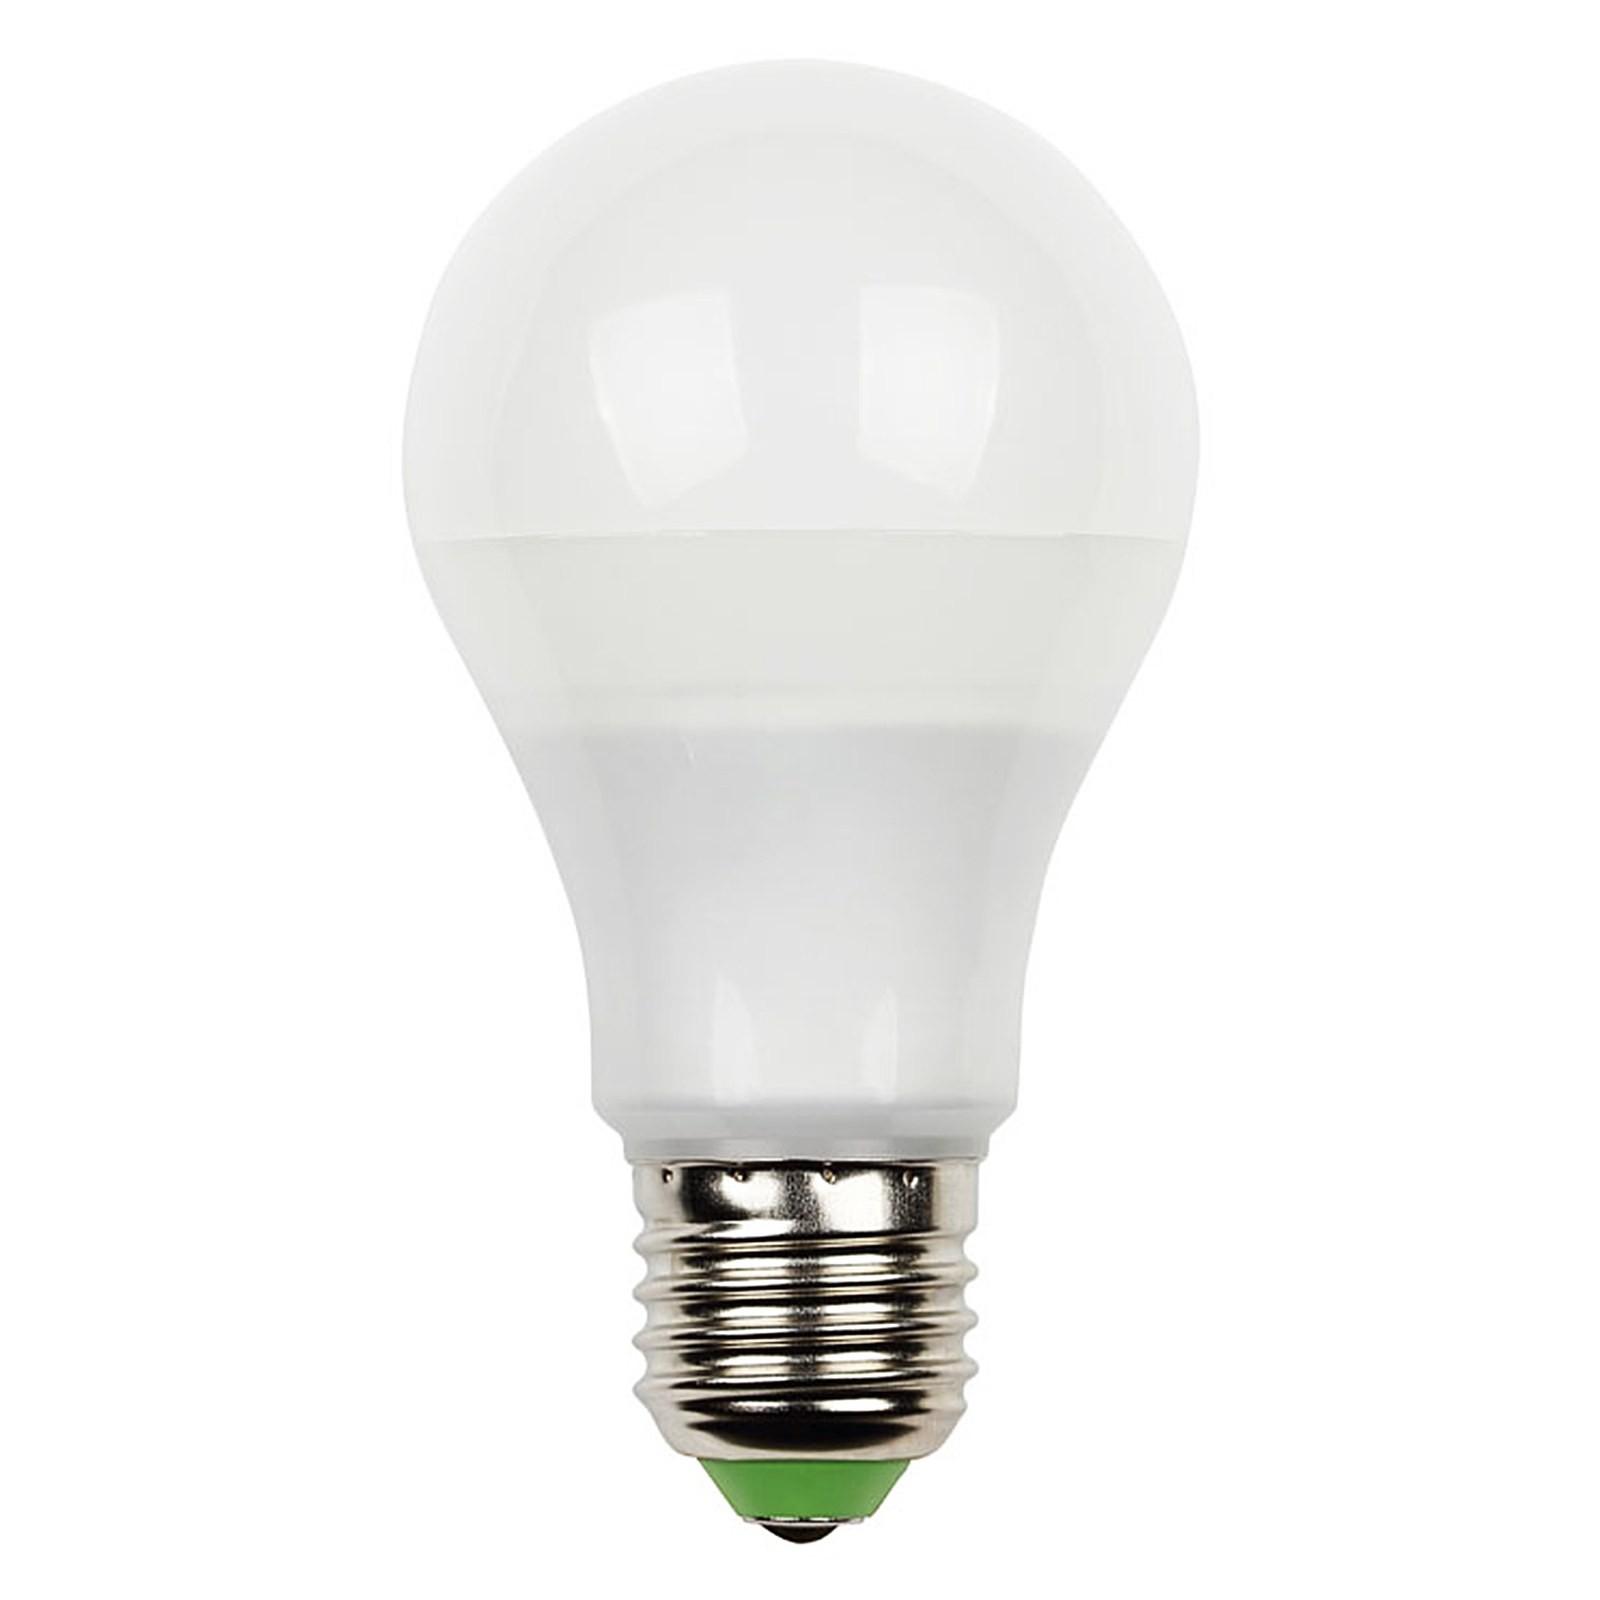 3 pz lampade lampada lampadine a led luce bianca fredda for Lampadine led 3 watt